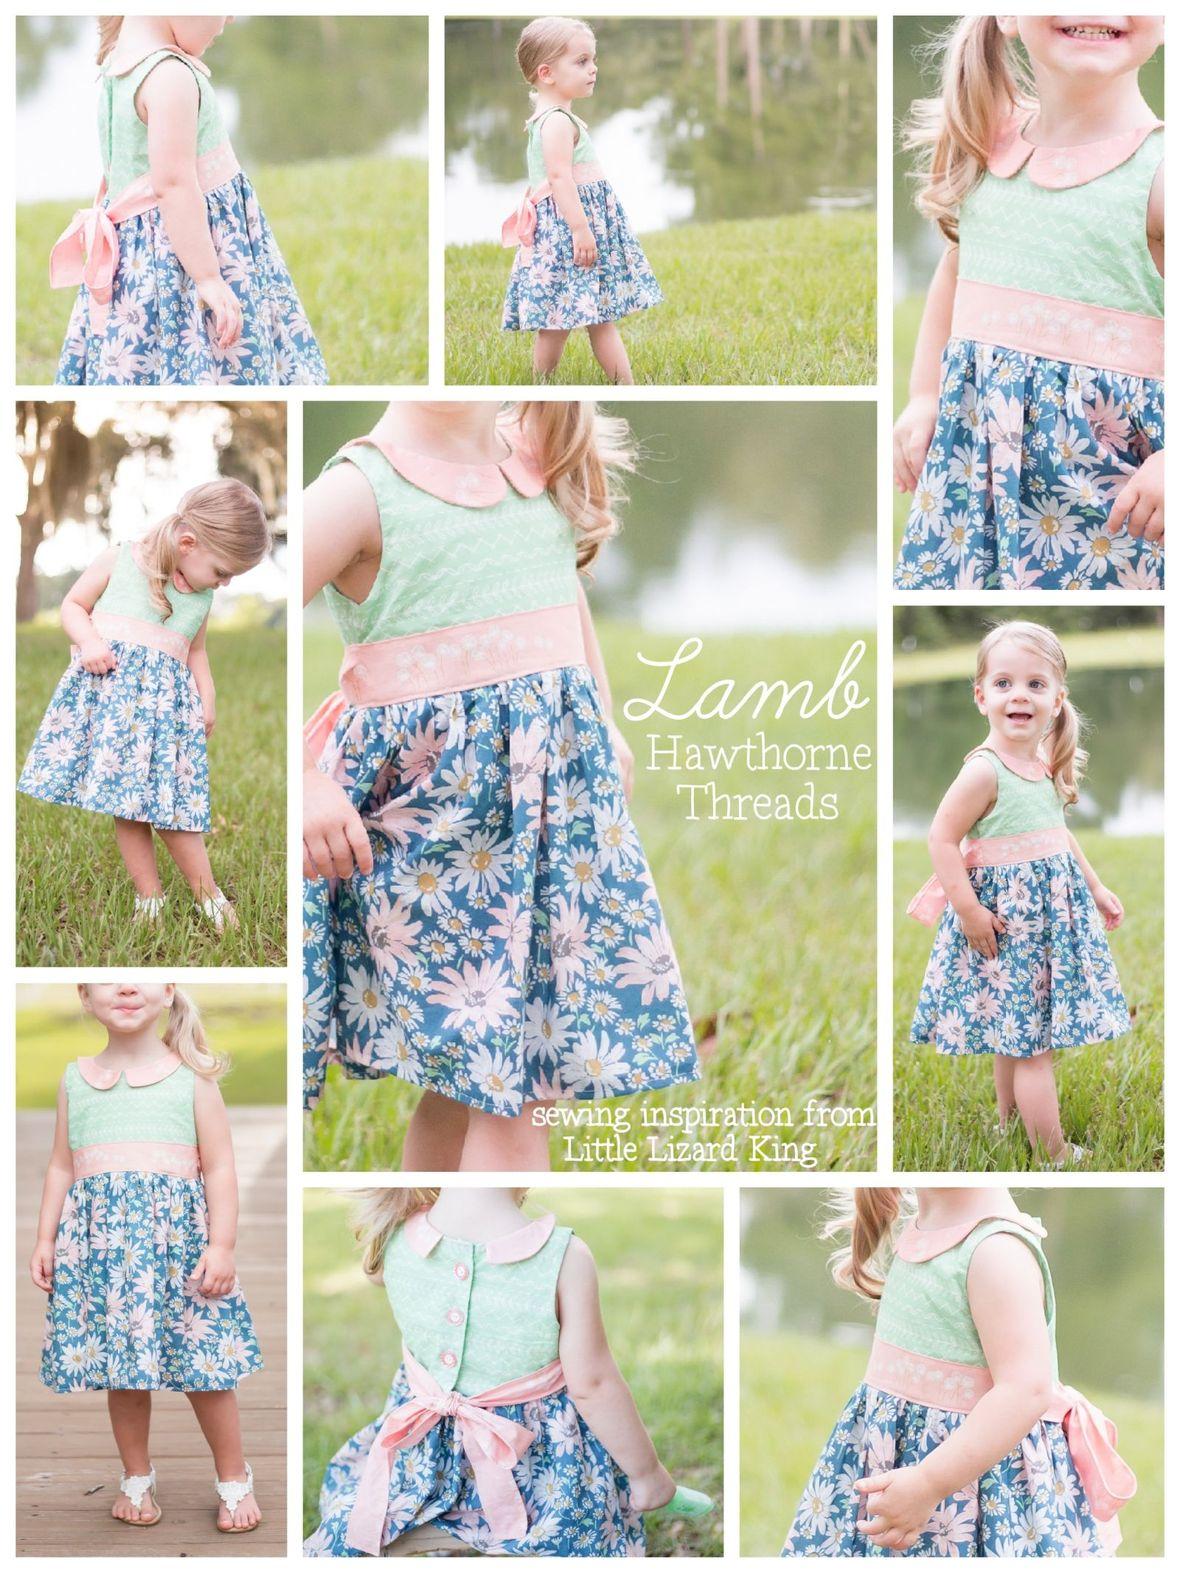 Hawthorne Threads Lamb Fabric Little Lizard King Dress